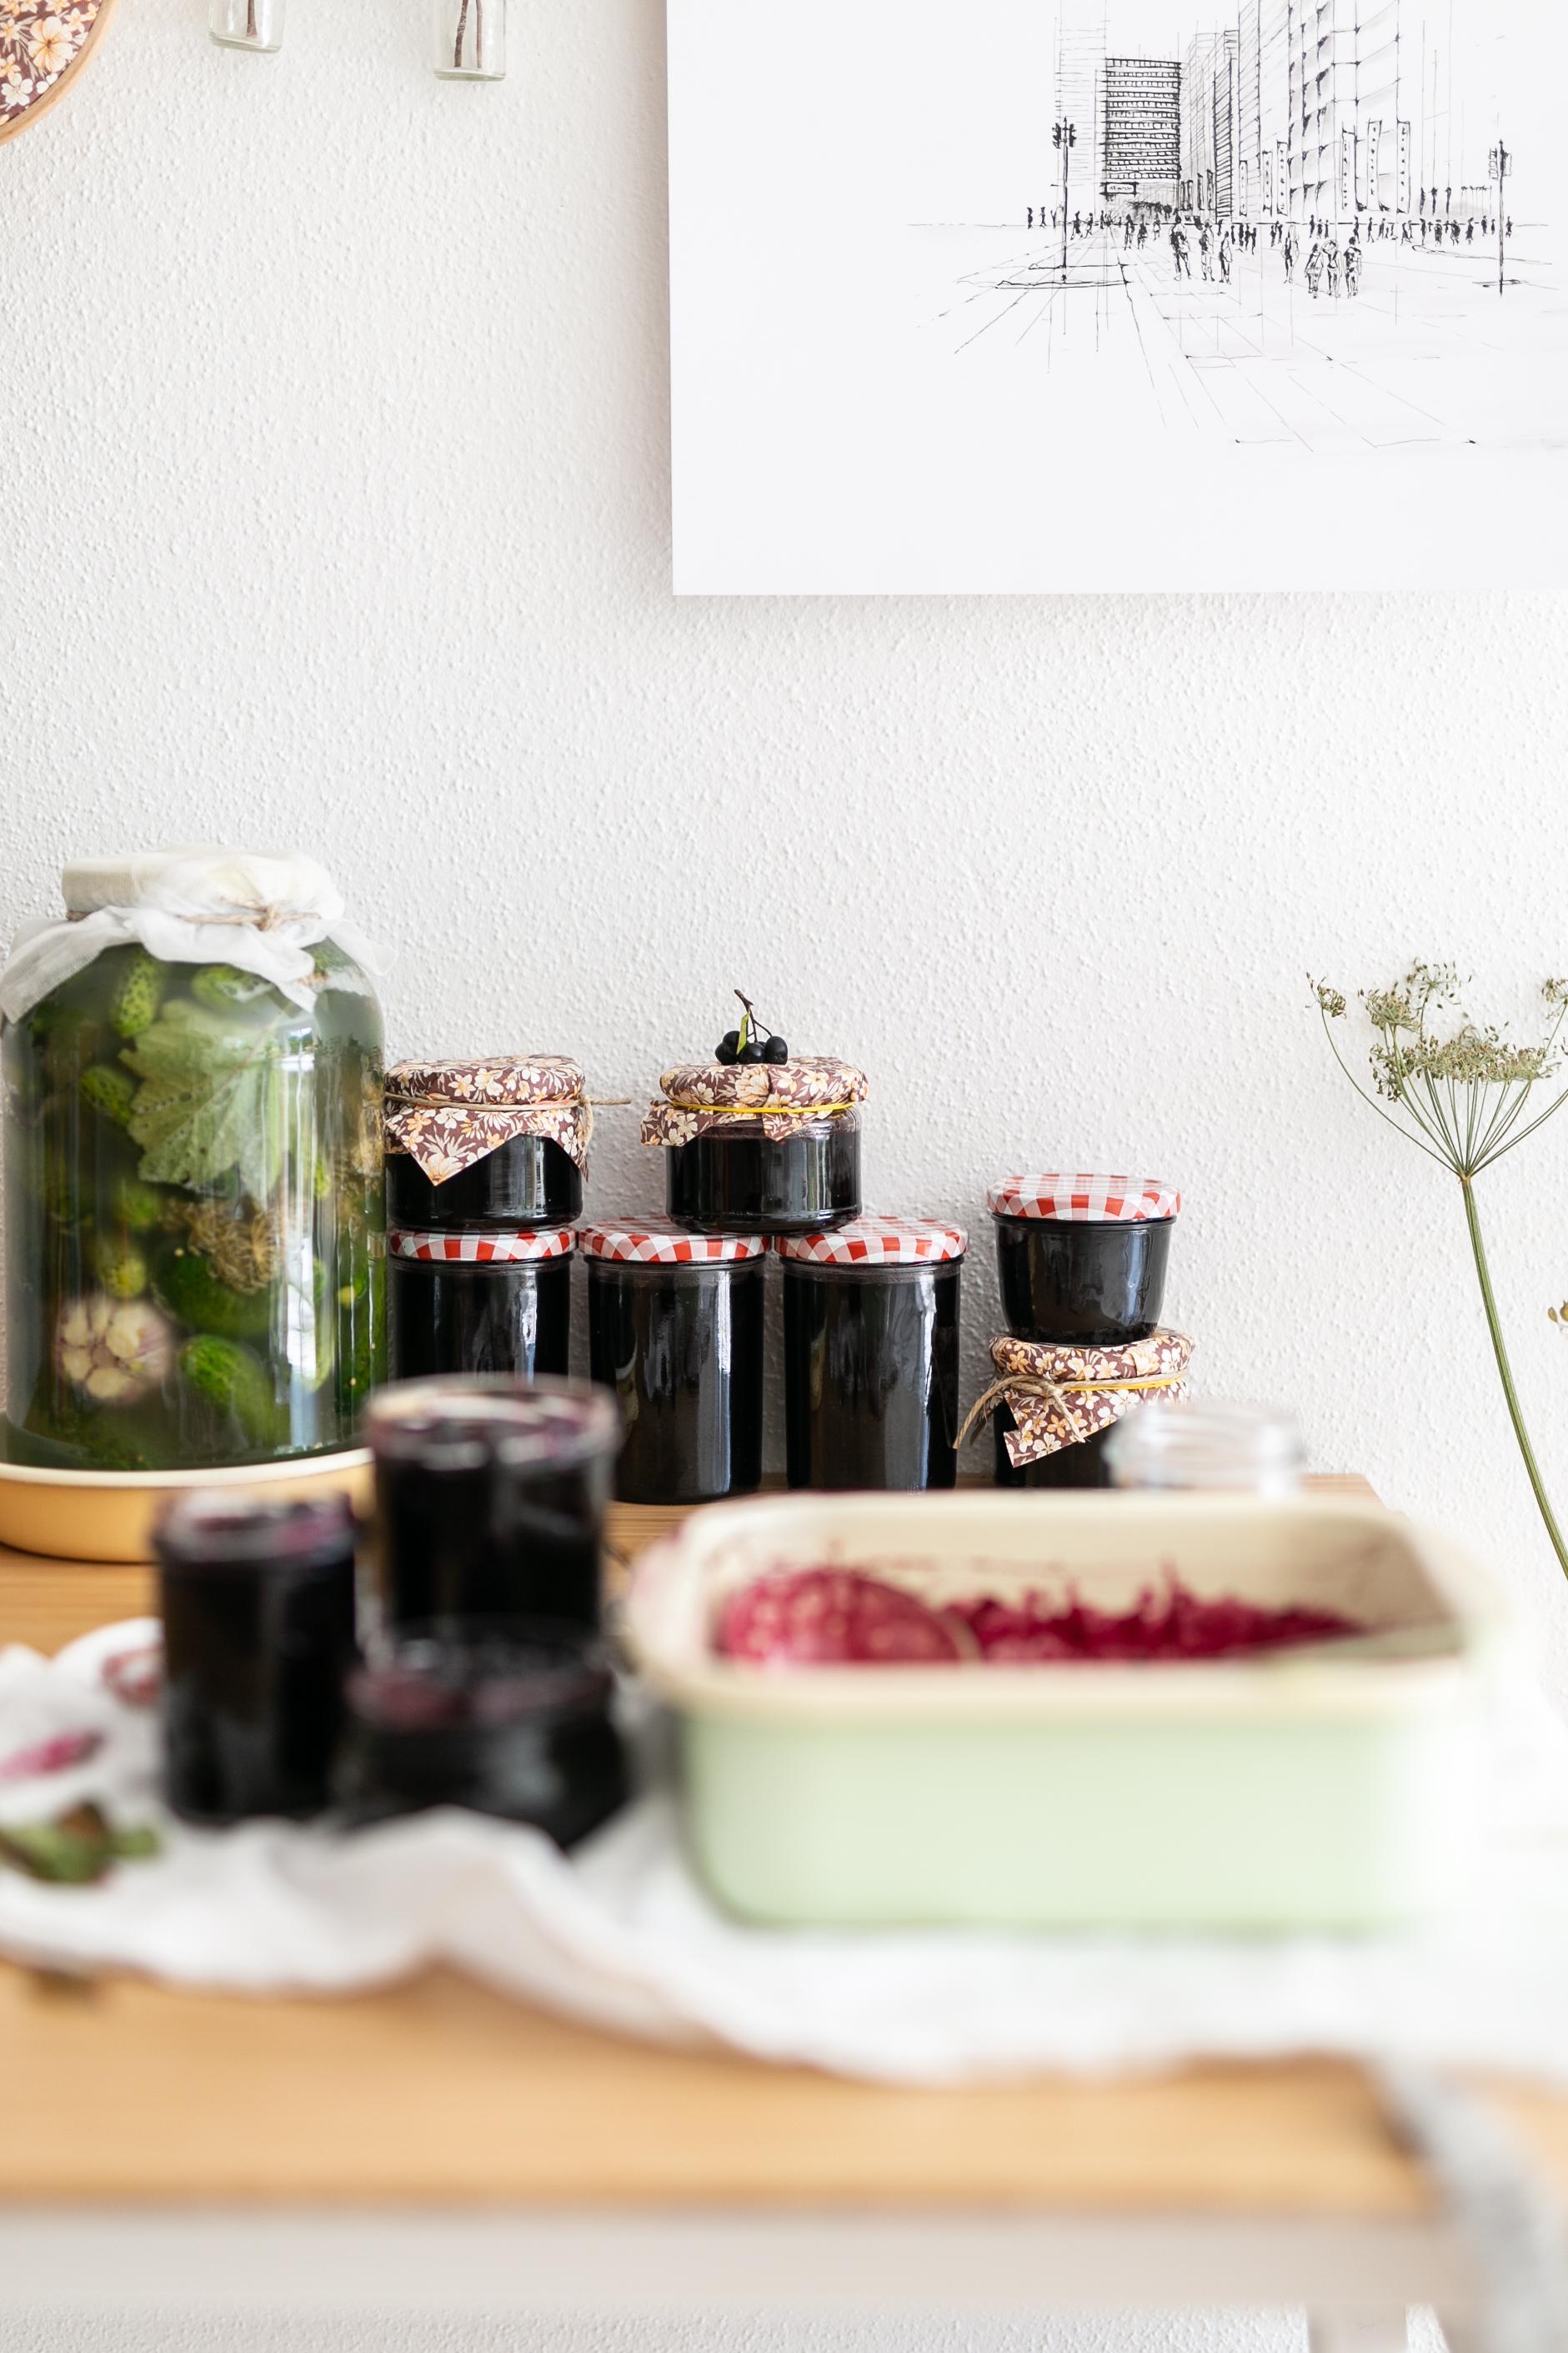 Aroniabeeren Rezepte | Gesunde vegane Rezepte, Fermentation, Nachhaltigkeit - Syl Gervais